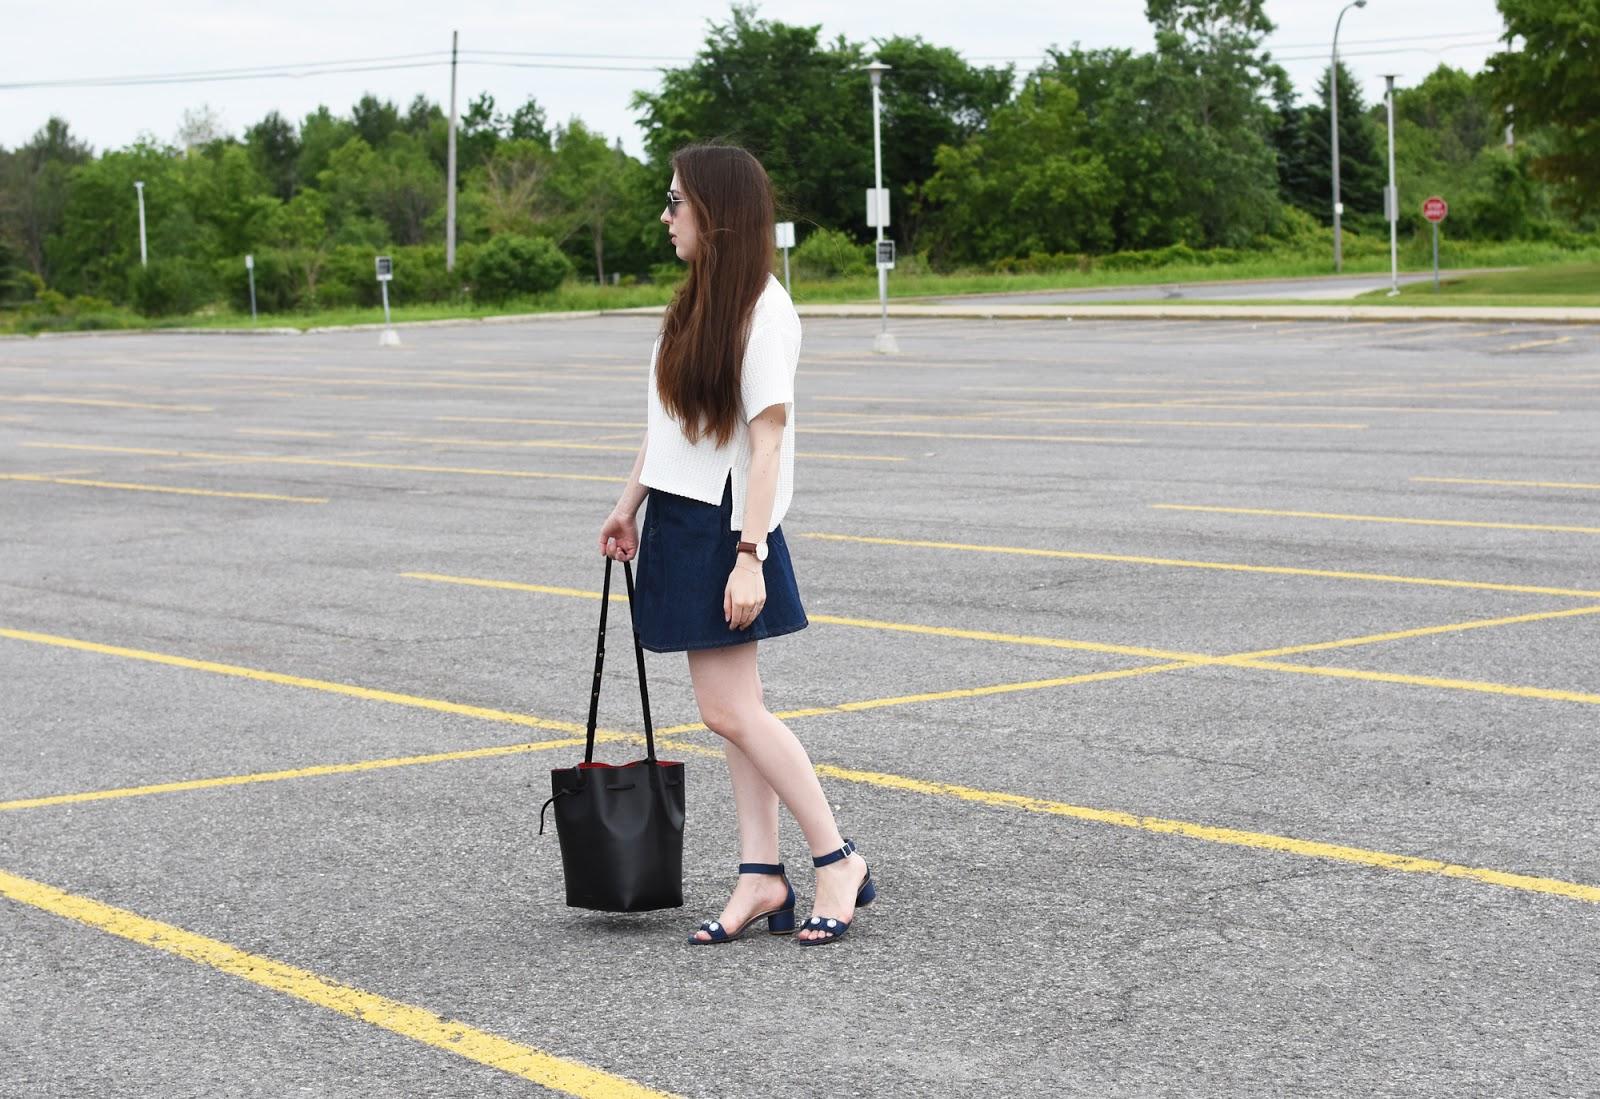 90s inspired OOTD ft. Forever 21 top and denim skirt, Zara block heel sandals, Mansur Gavriel bag, and Warby Parker sunglasses.